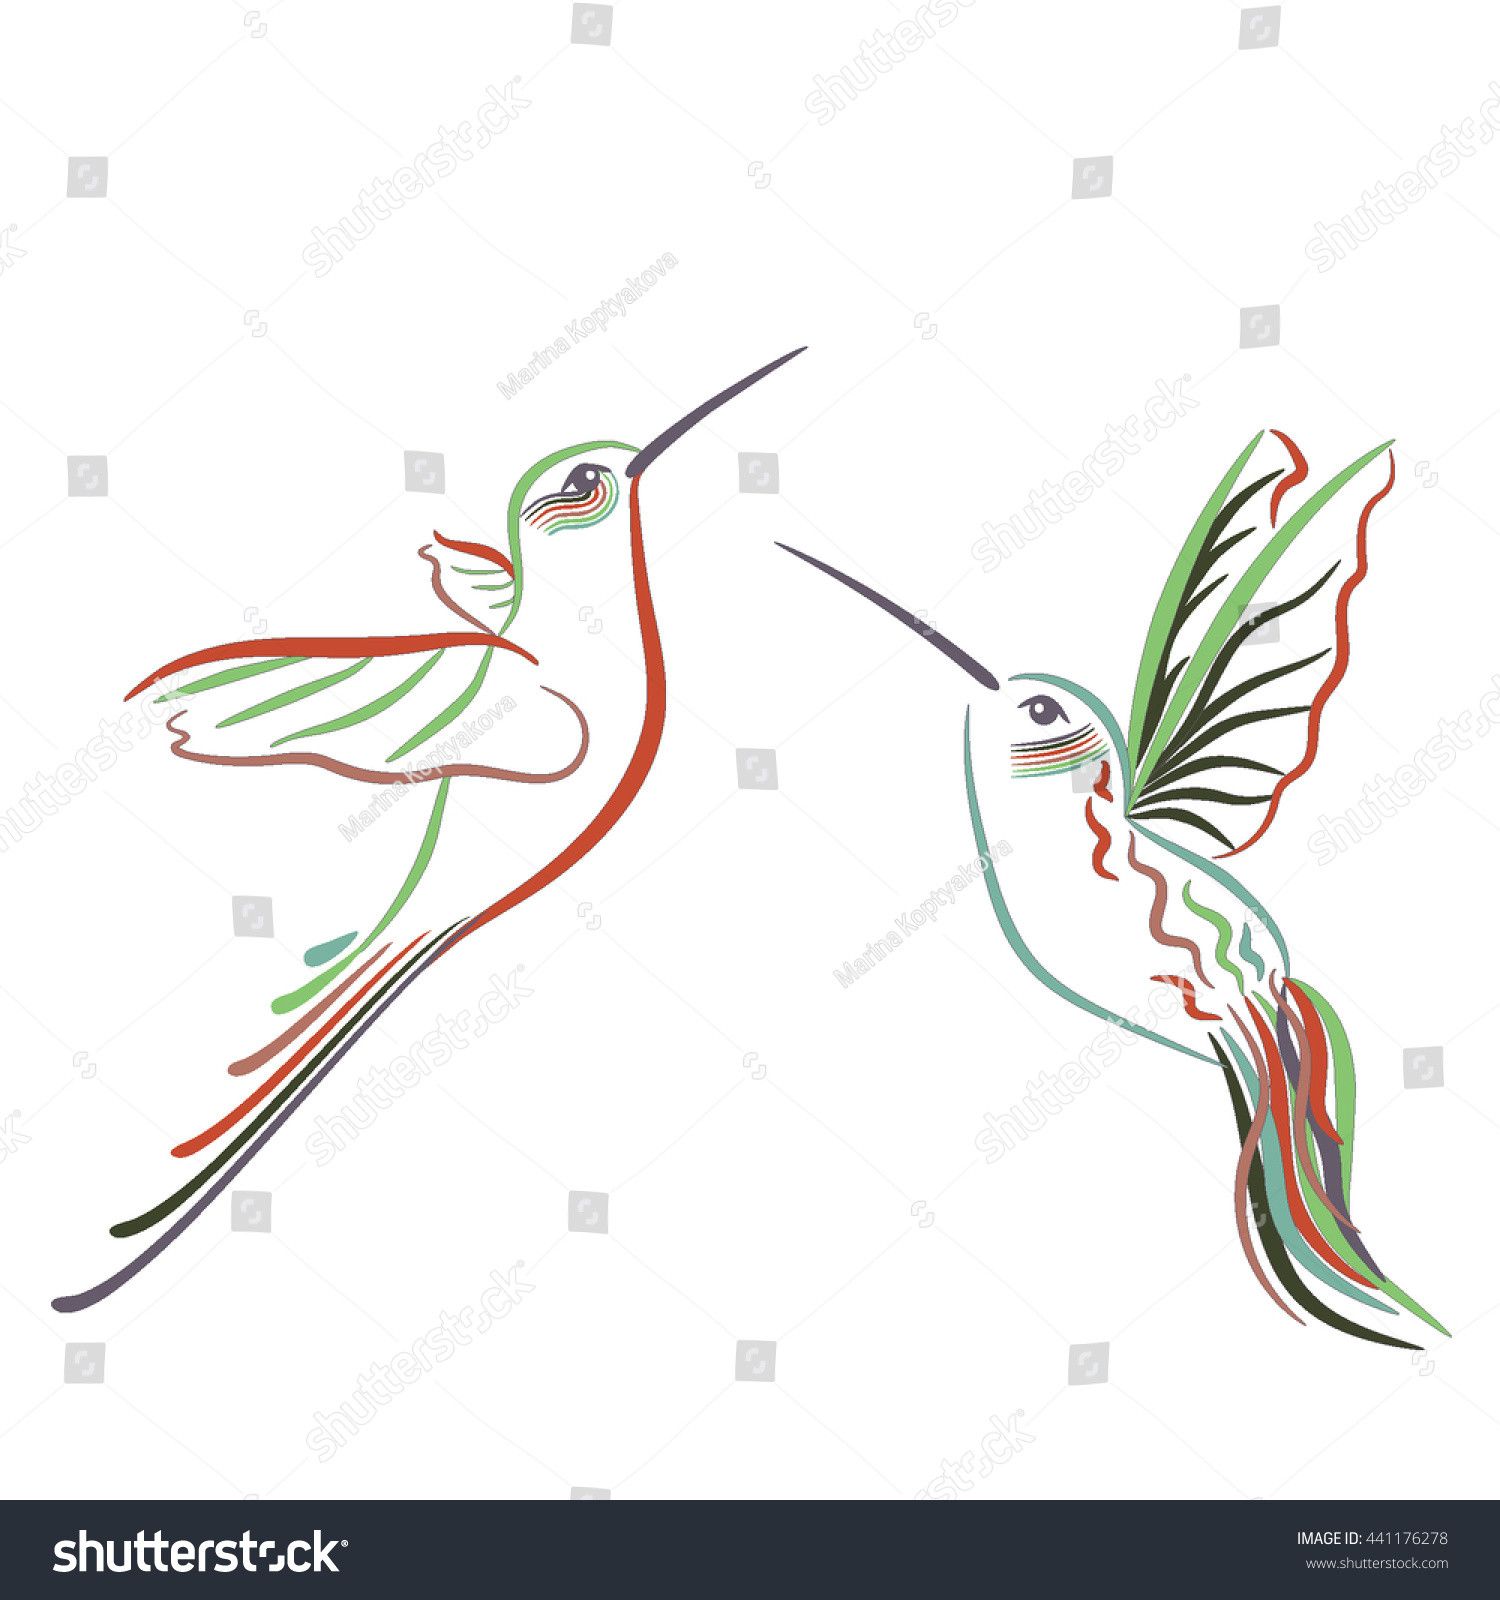 Colored hummingbird symbols logo stock vector 441176278 shutterstock colored hummingbird symbols logo biocorpaavc Images